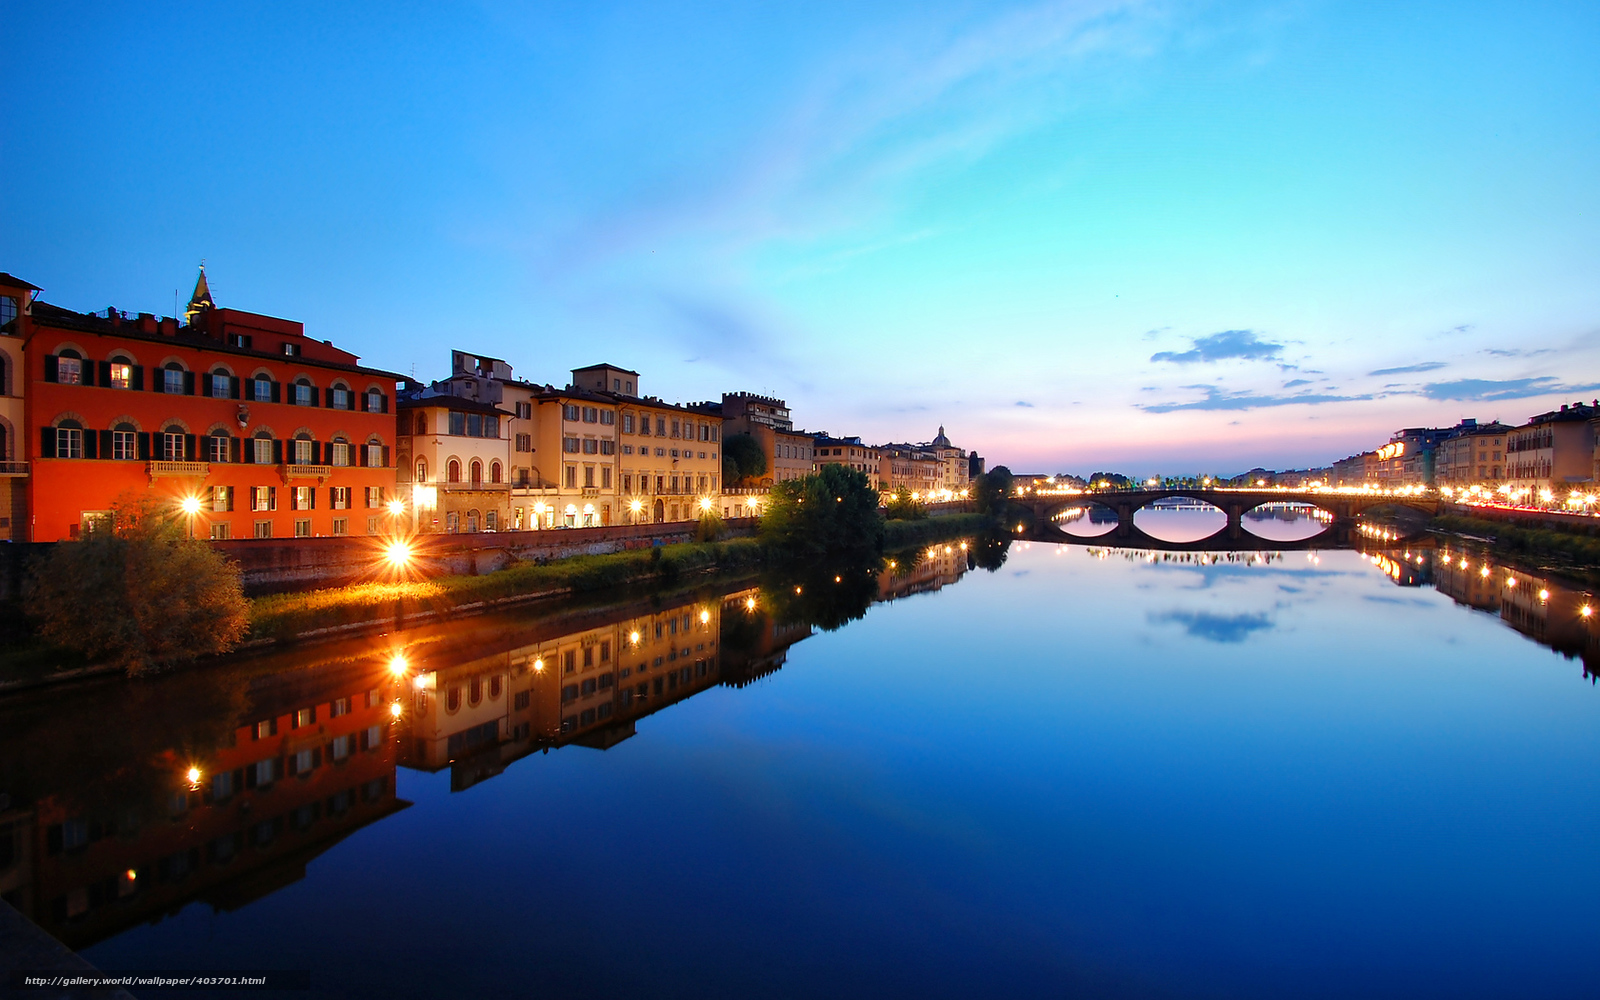 Download wallpaper Florence Italy desktop wallpaper in the 1600x1000